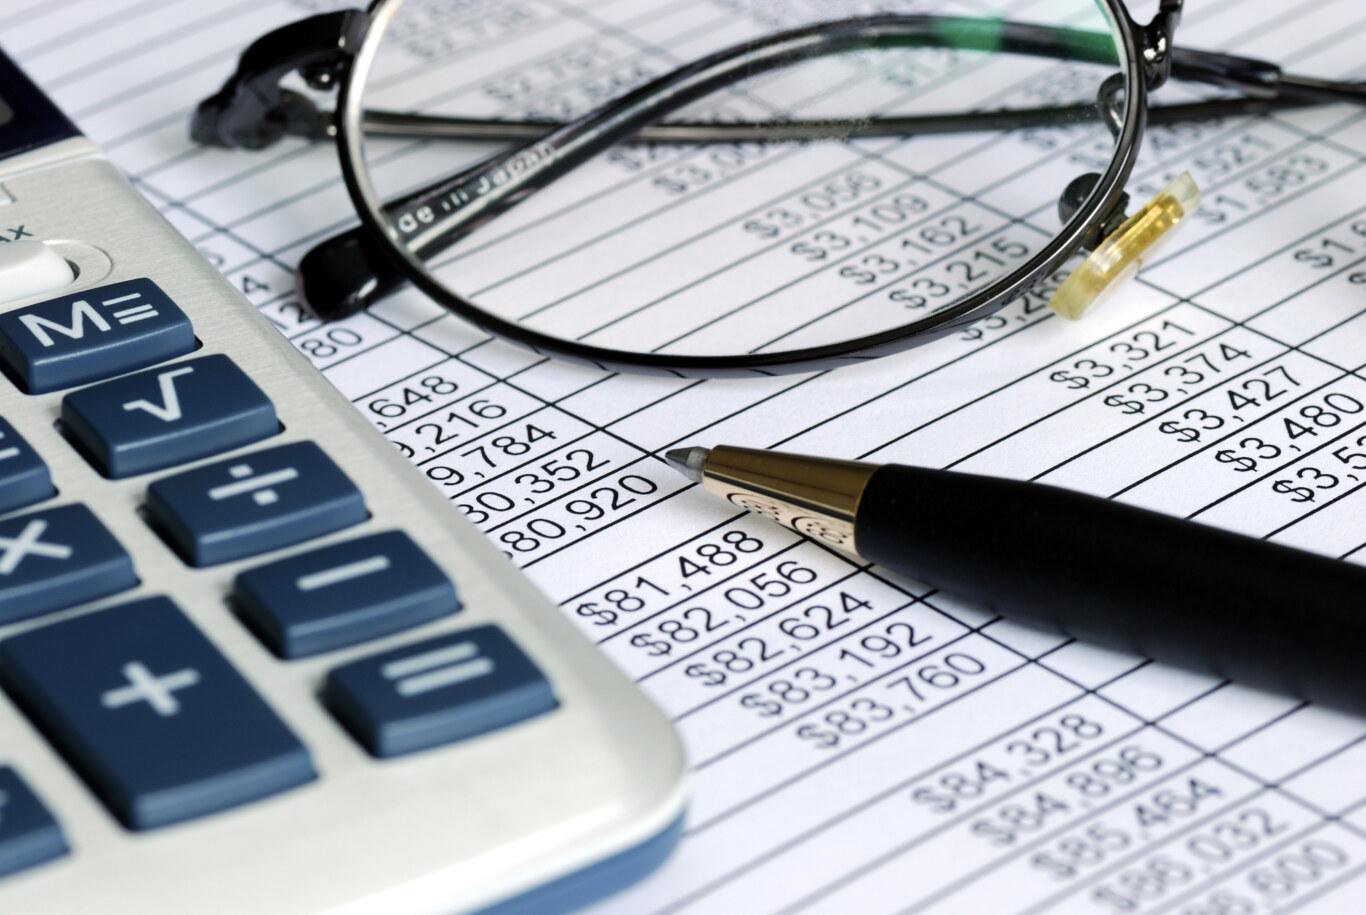 glasses-budget-calculator